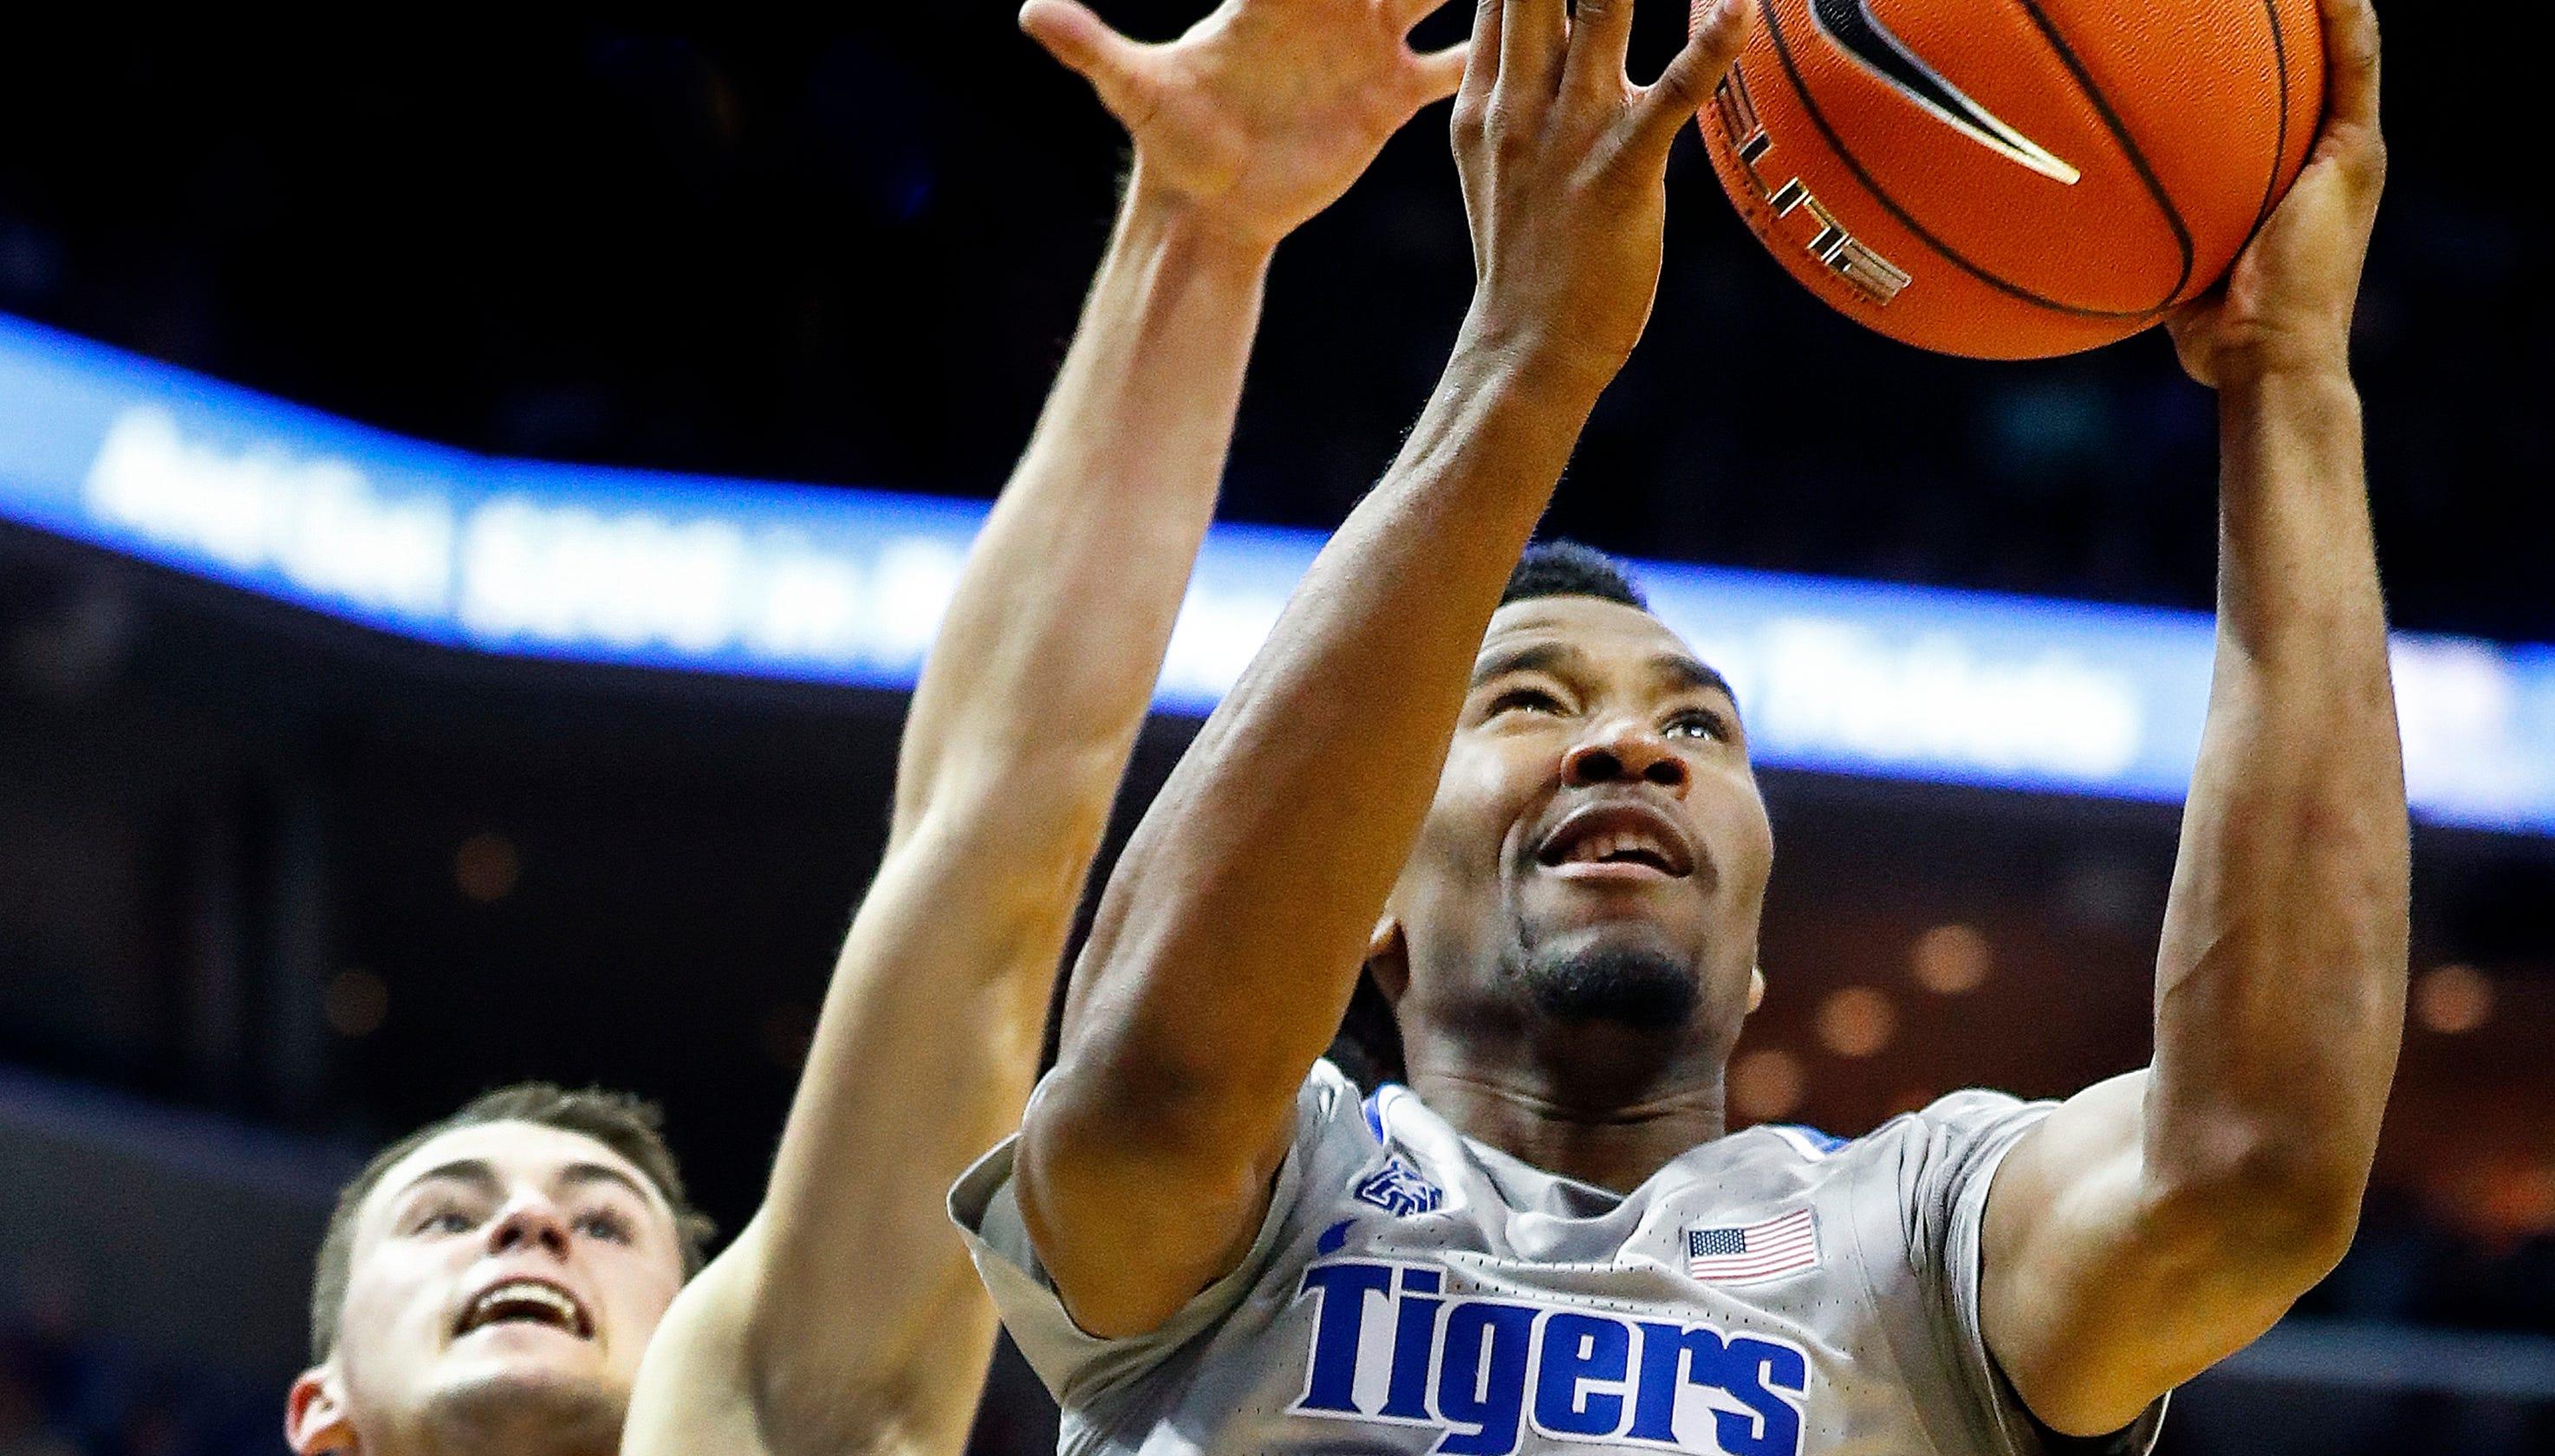 memphis basketball: penny hardaway beats tennessee tech for first win